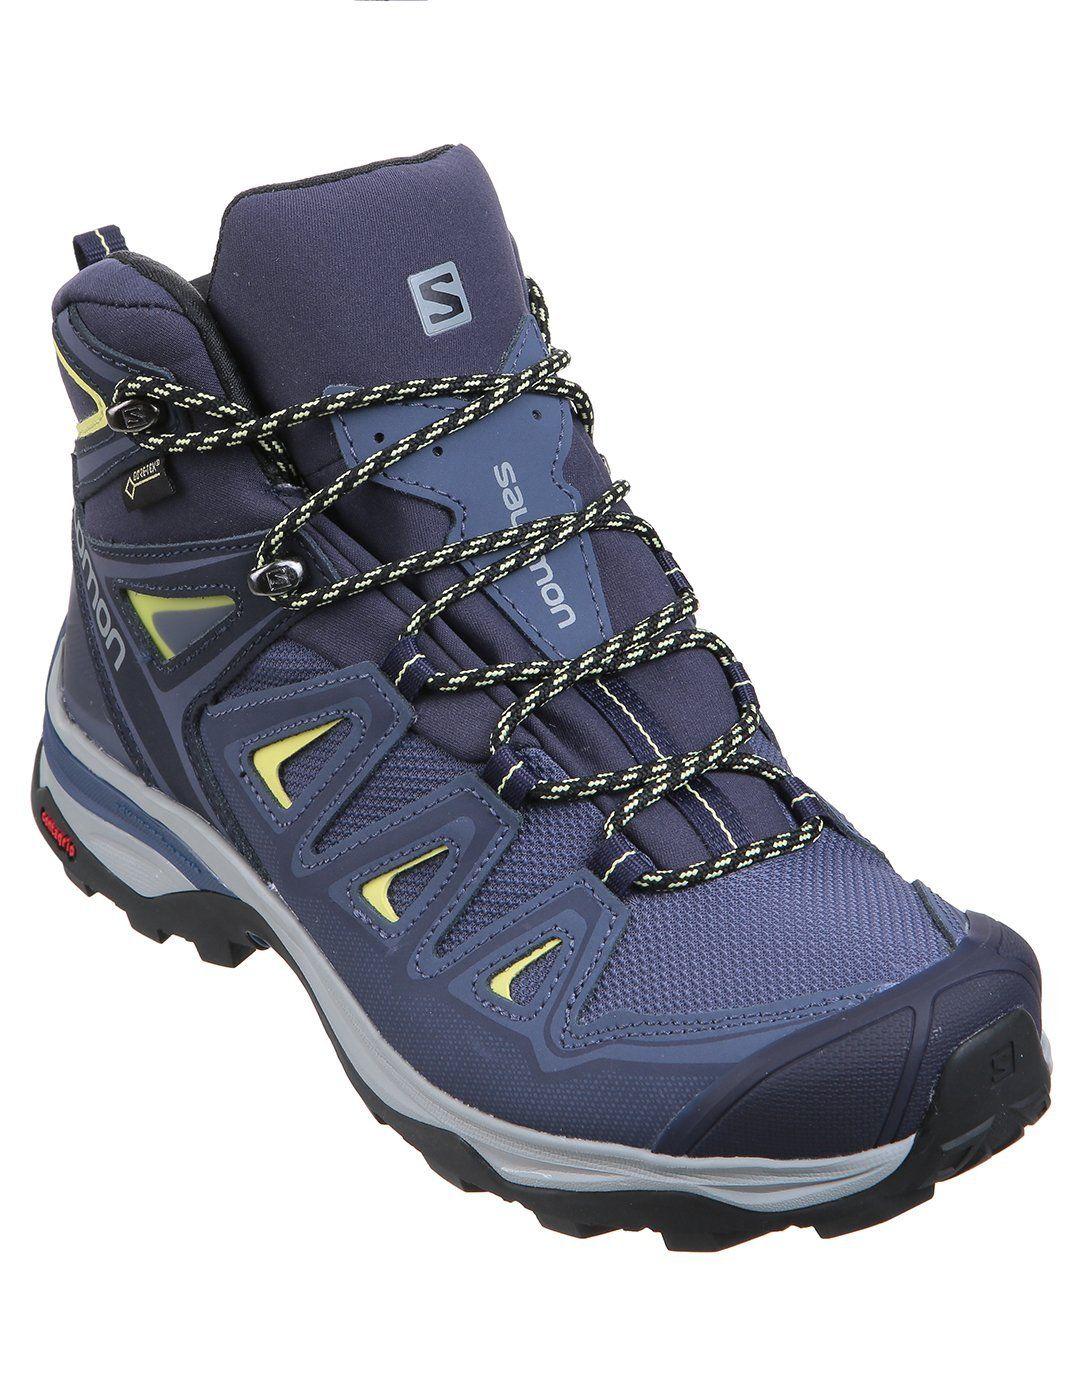 info for 08135 2c634 Salomon Women's X Ultra 3 Mid GTX Hiking Boots Shadow/Castor ...